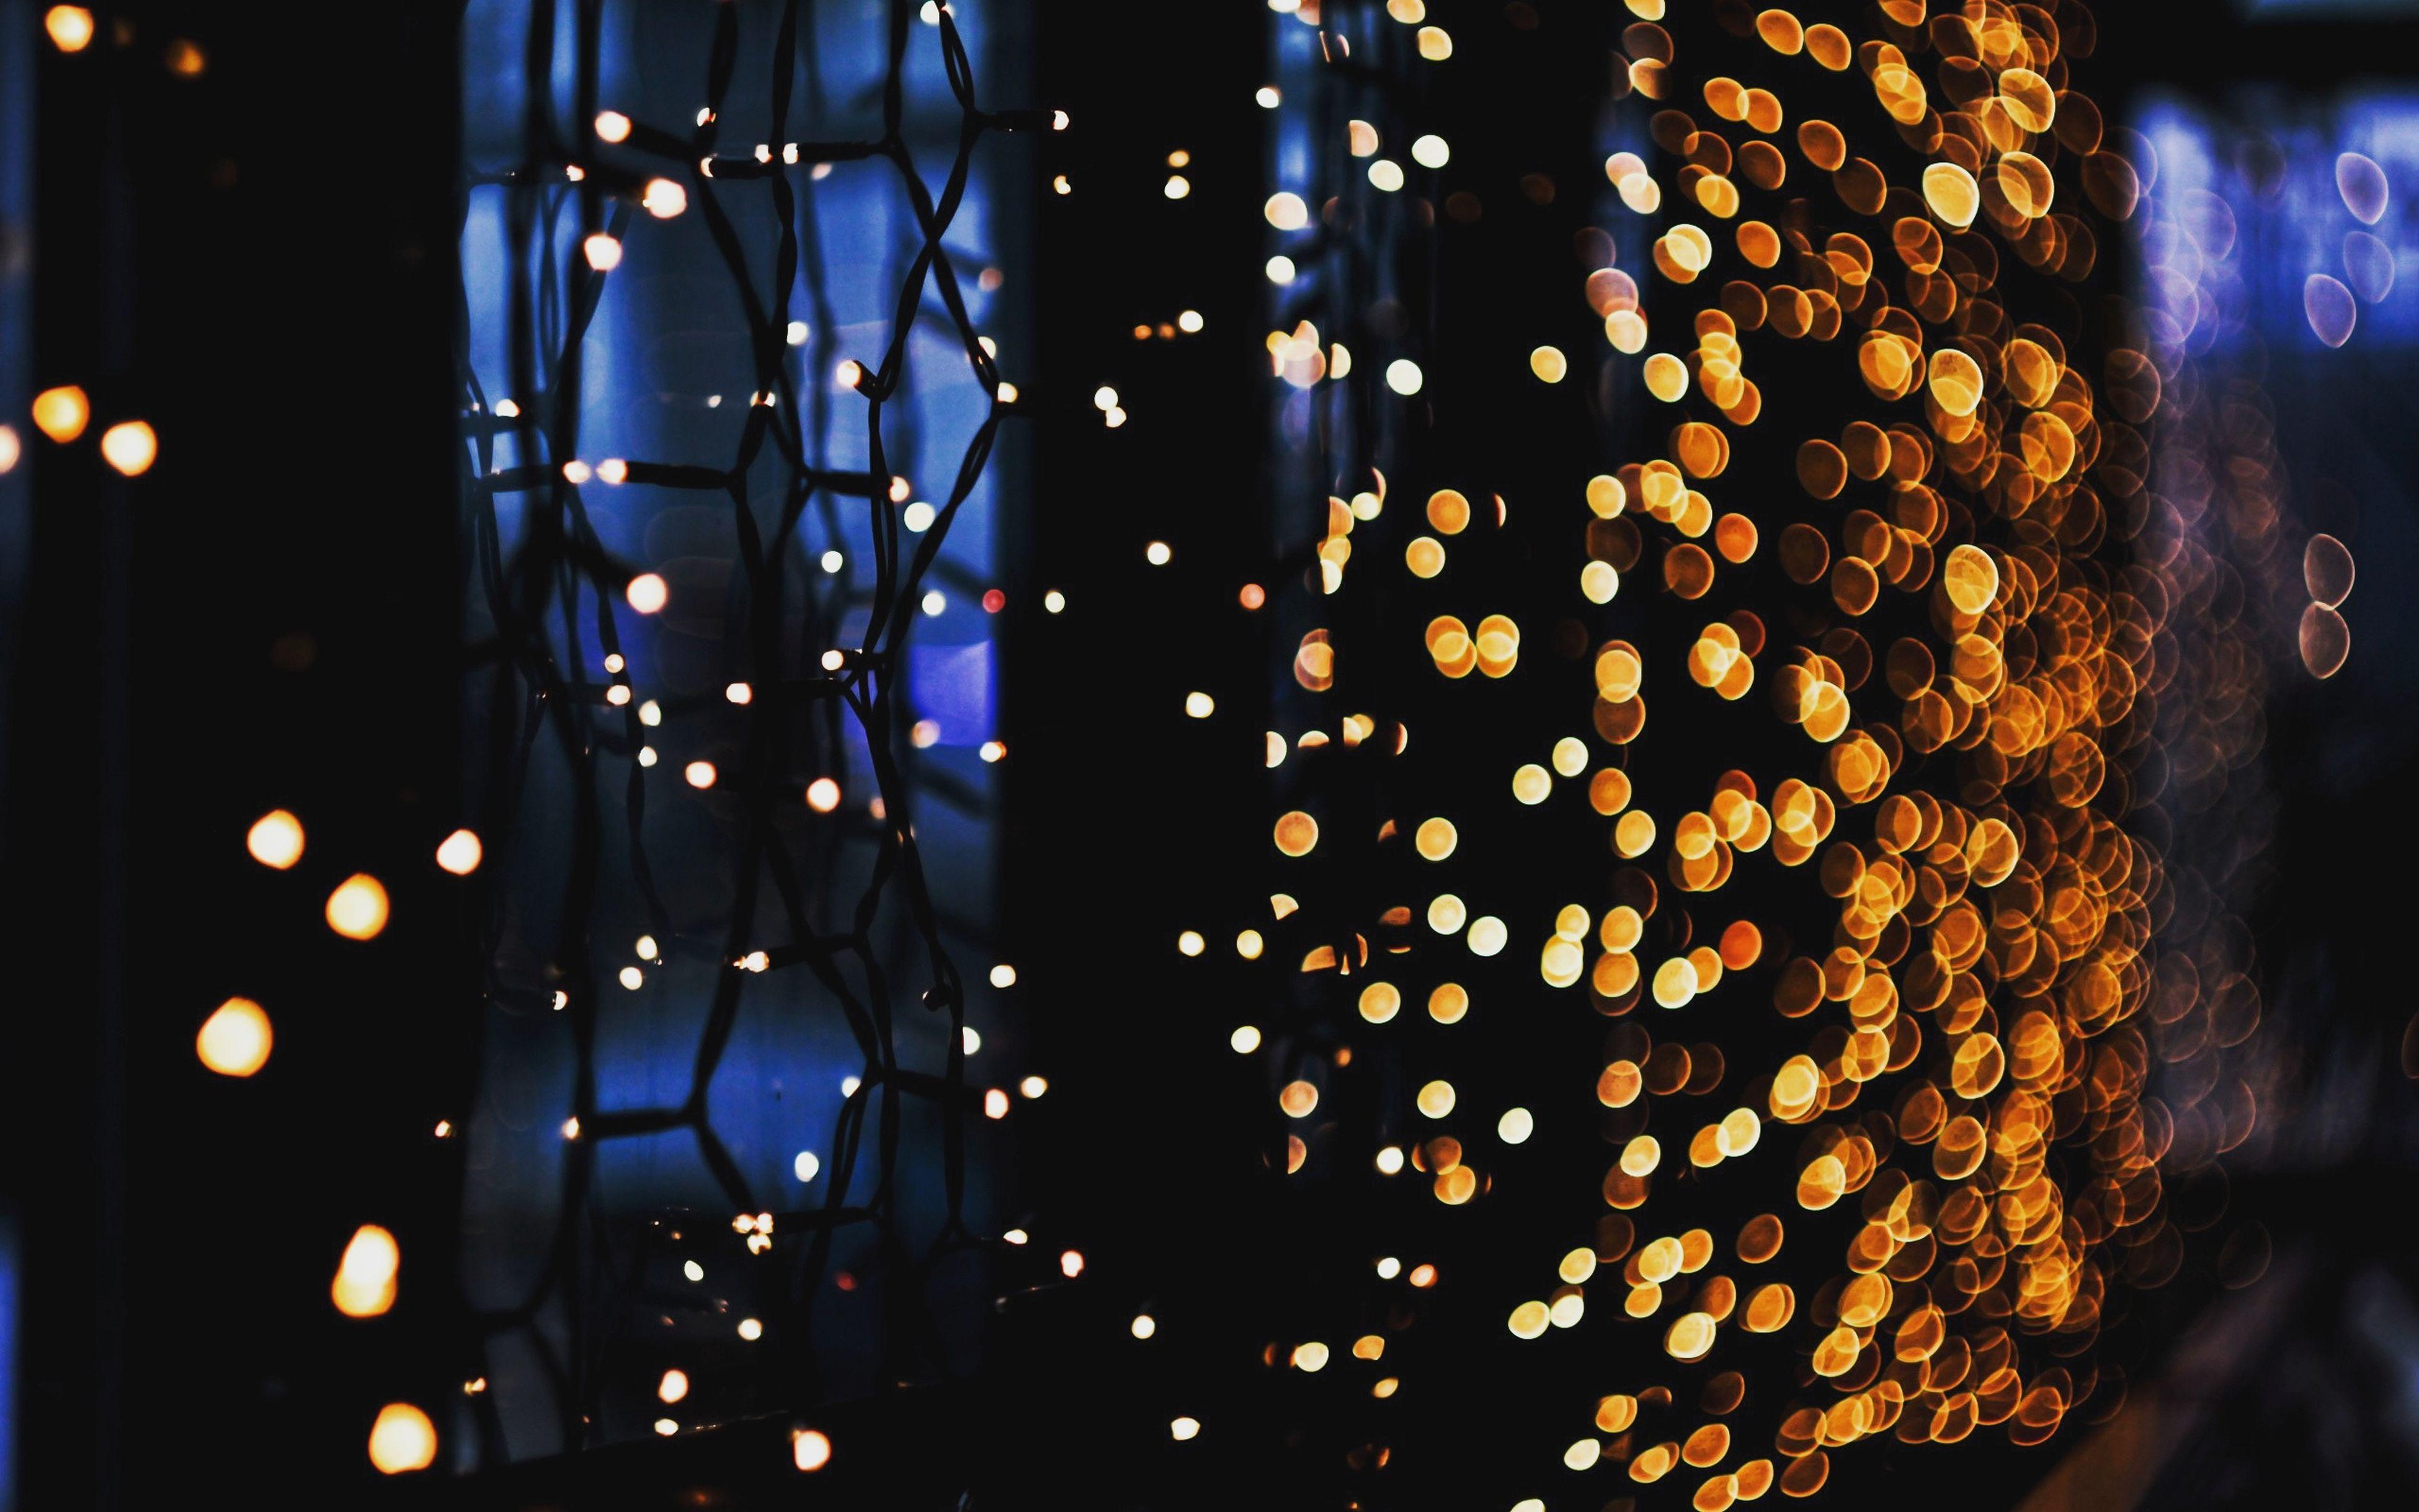 illuminated, night, lighting equipment, glowing, decoration, blue, full frame, outdoors, geometric shape, no people